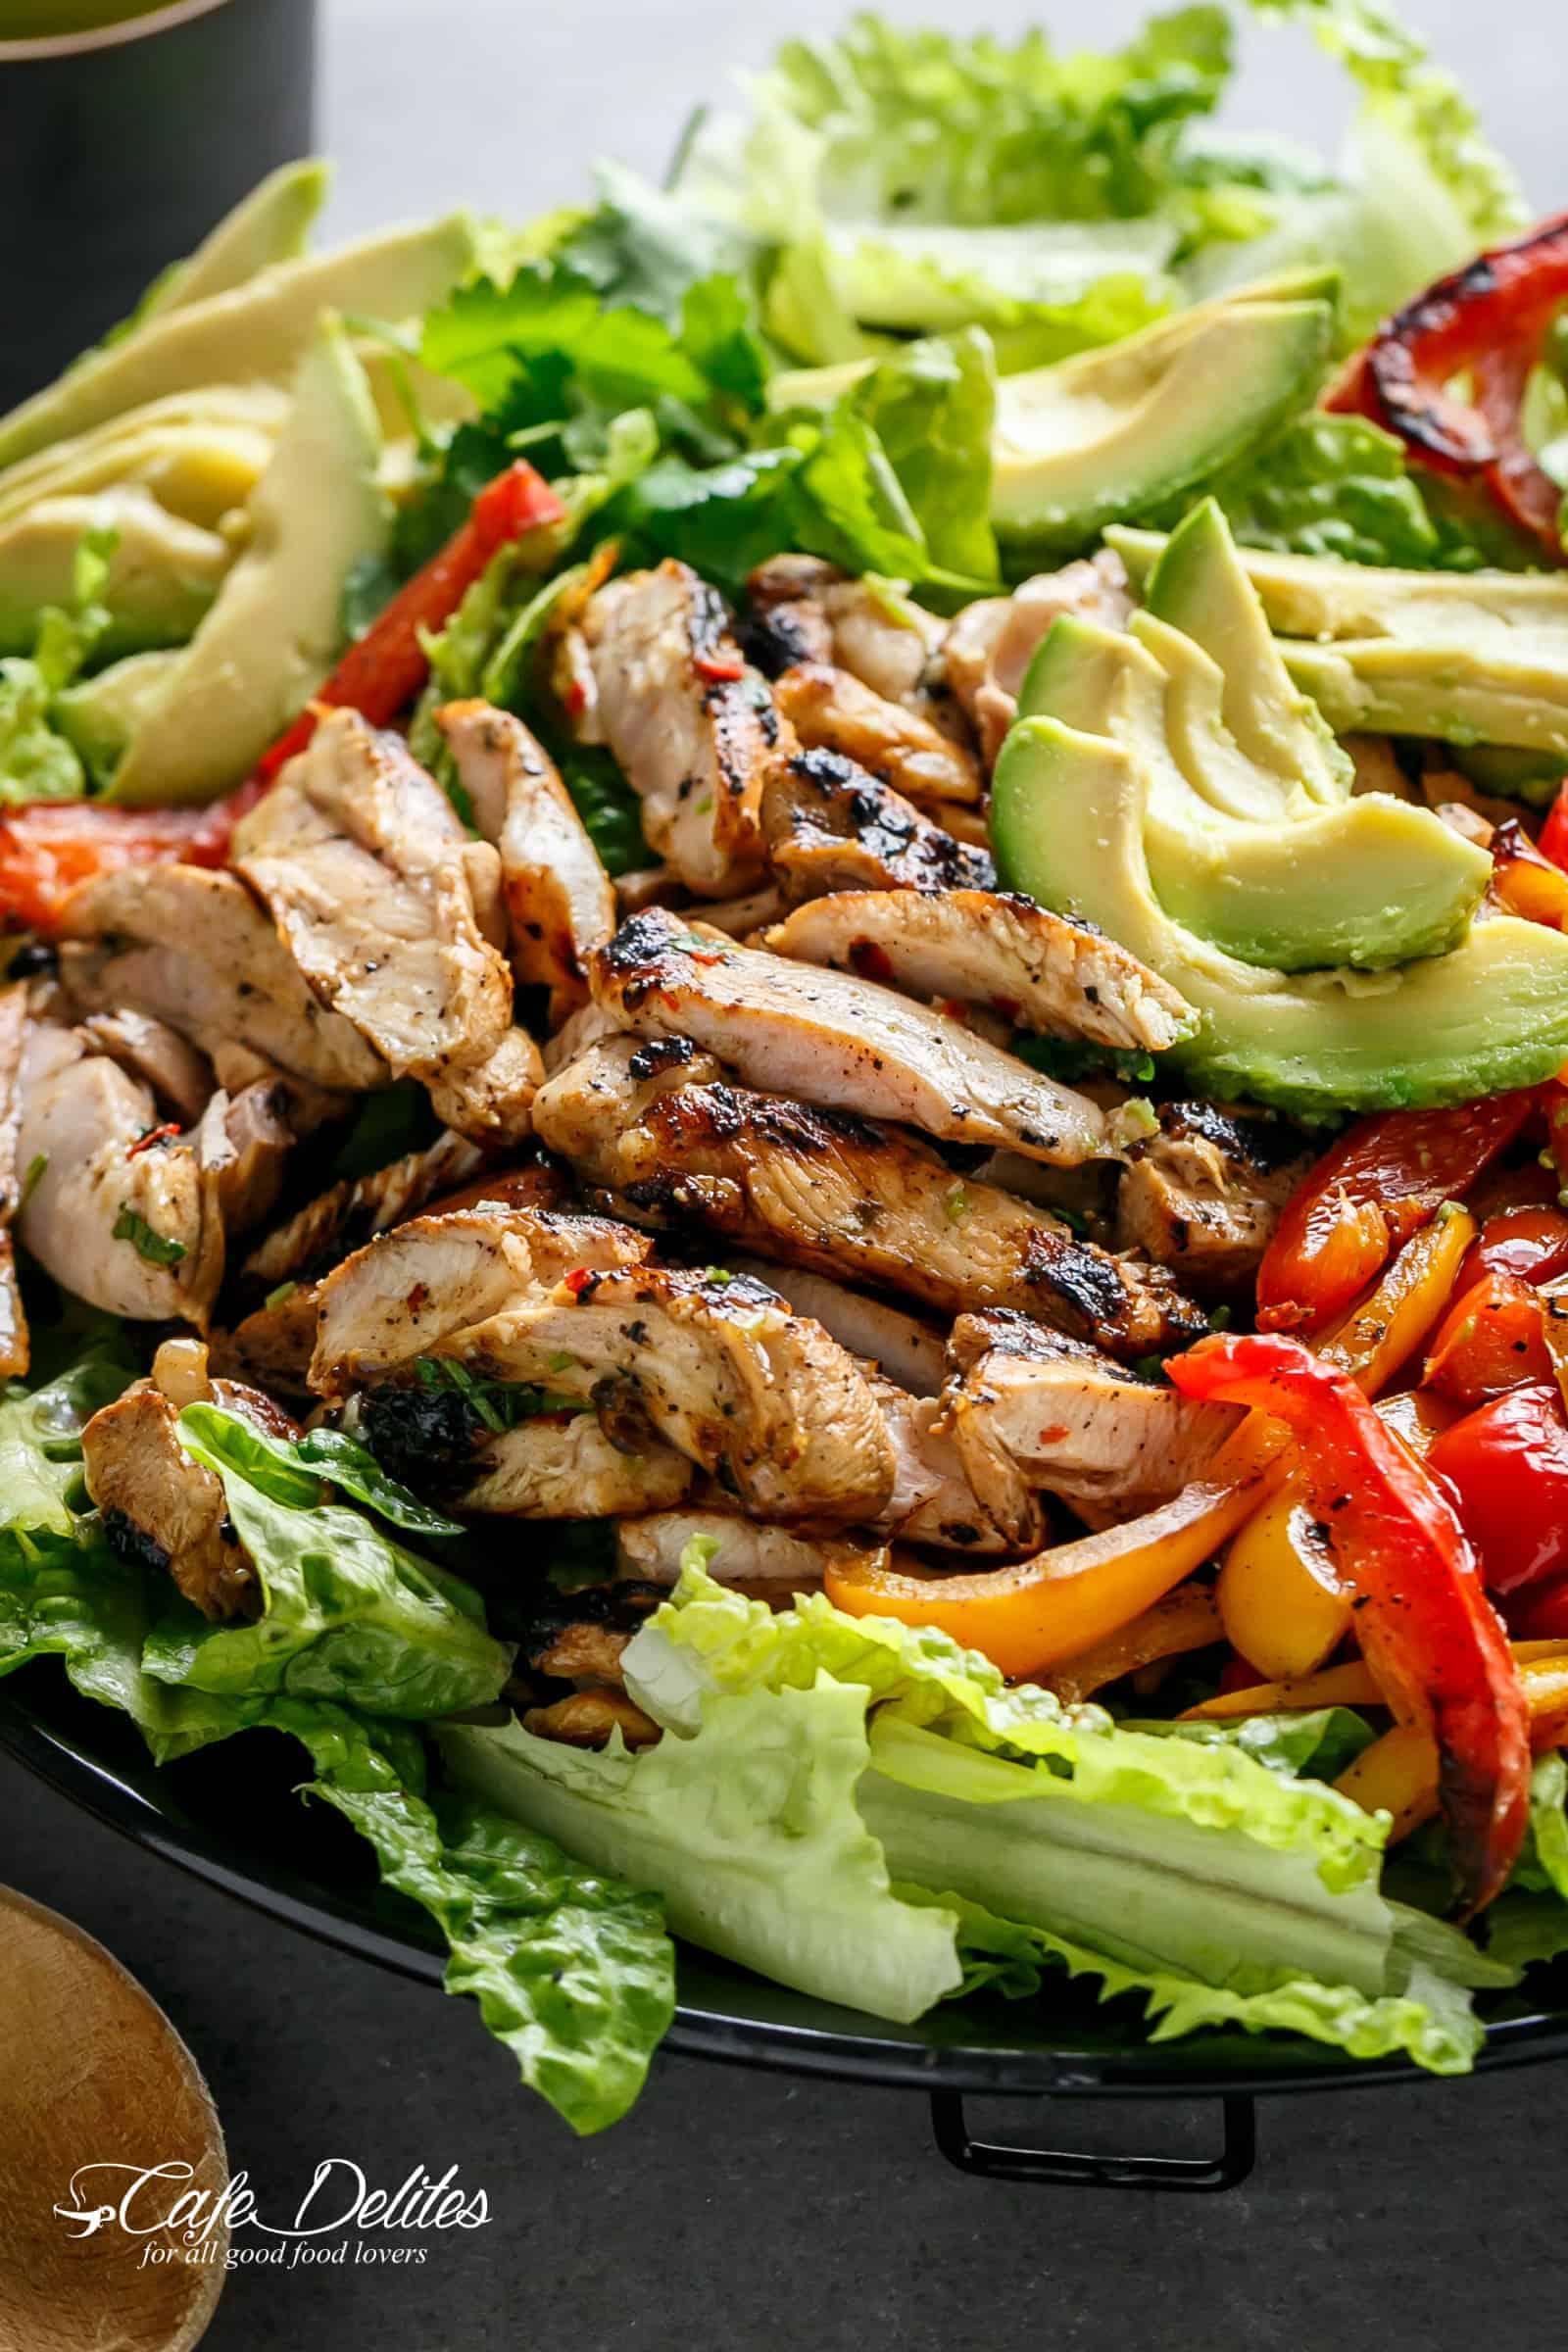 Grilled Chili Lime Chicken Fajita Salad, ketogenic, low carb, keto food, bbq food